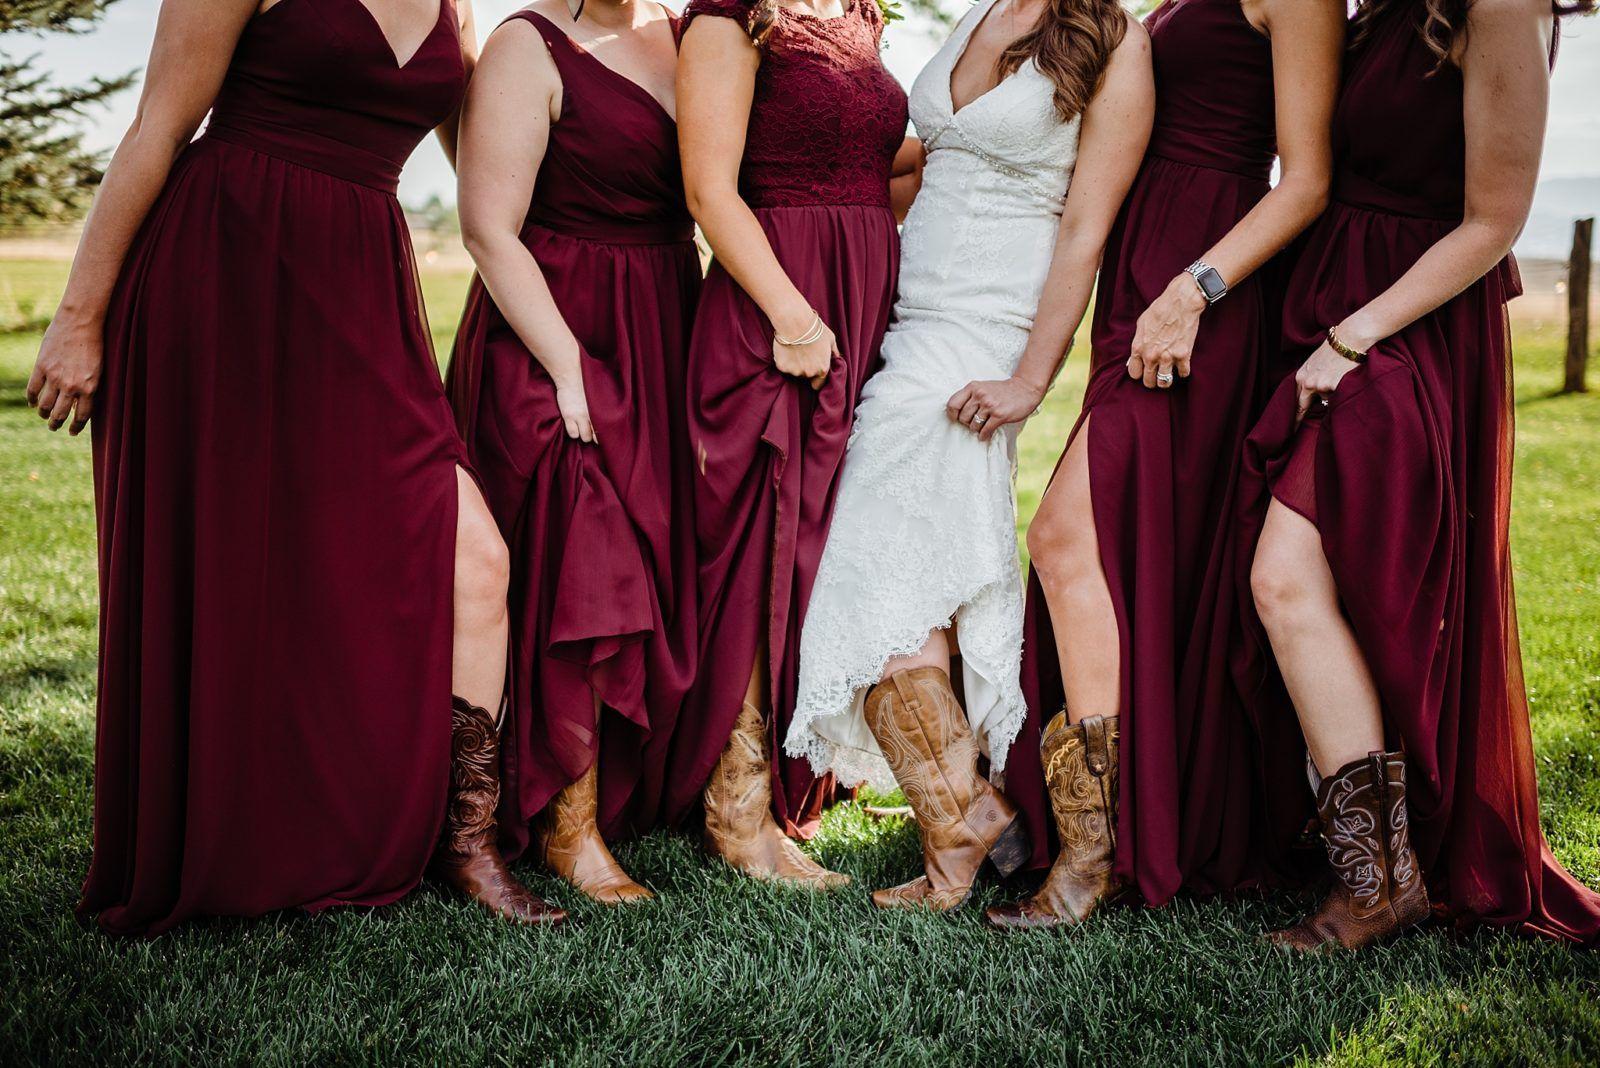 Maroon And Gray Wedding Party With Cowboy Boots Country Bridesmaid Dresses Maroon Bridesmaid Dresses Wedding Cowboy Boots